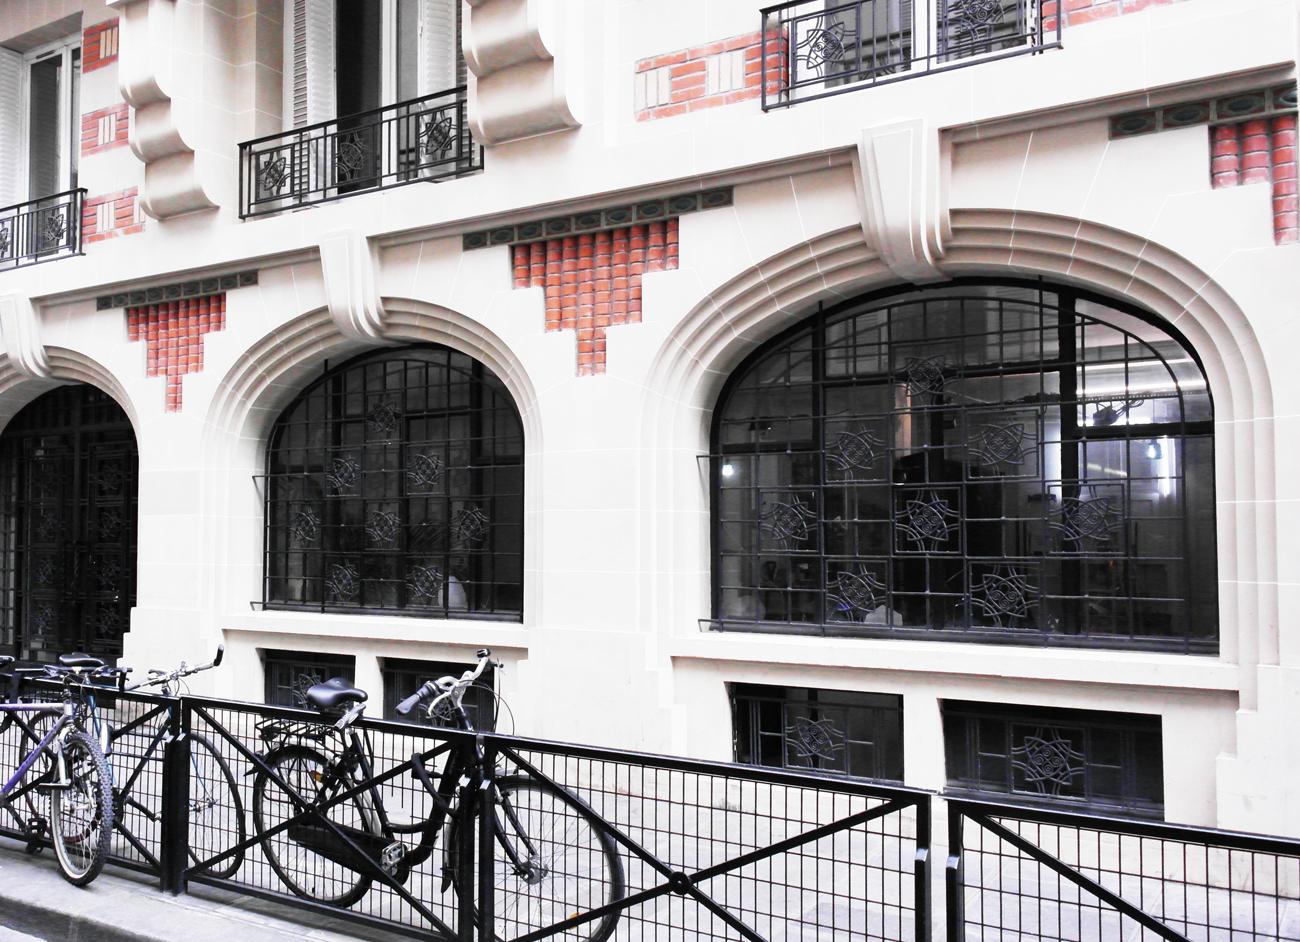 """celeste"" installationat galerie mi* paris : whole exhibition, and display + interactivity for (23, rue chapon Paris 3°)."